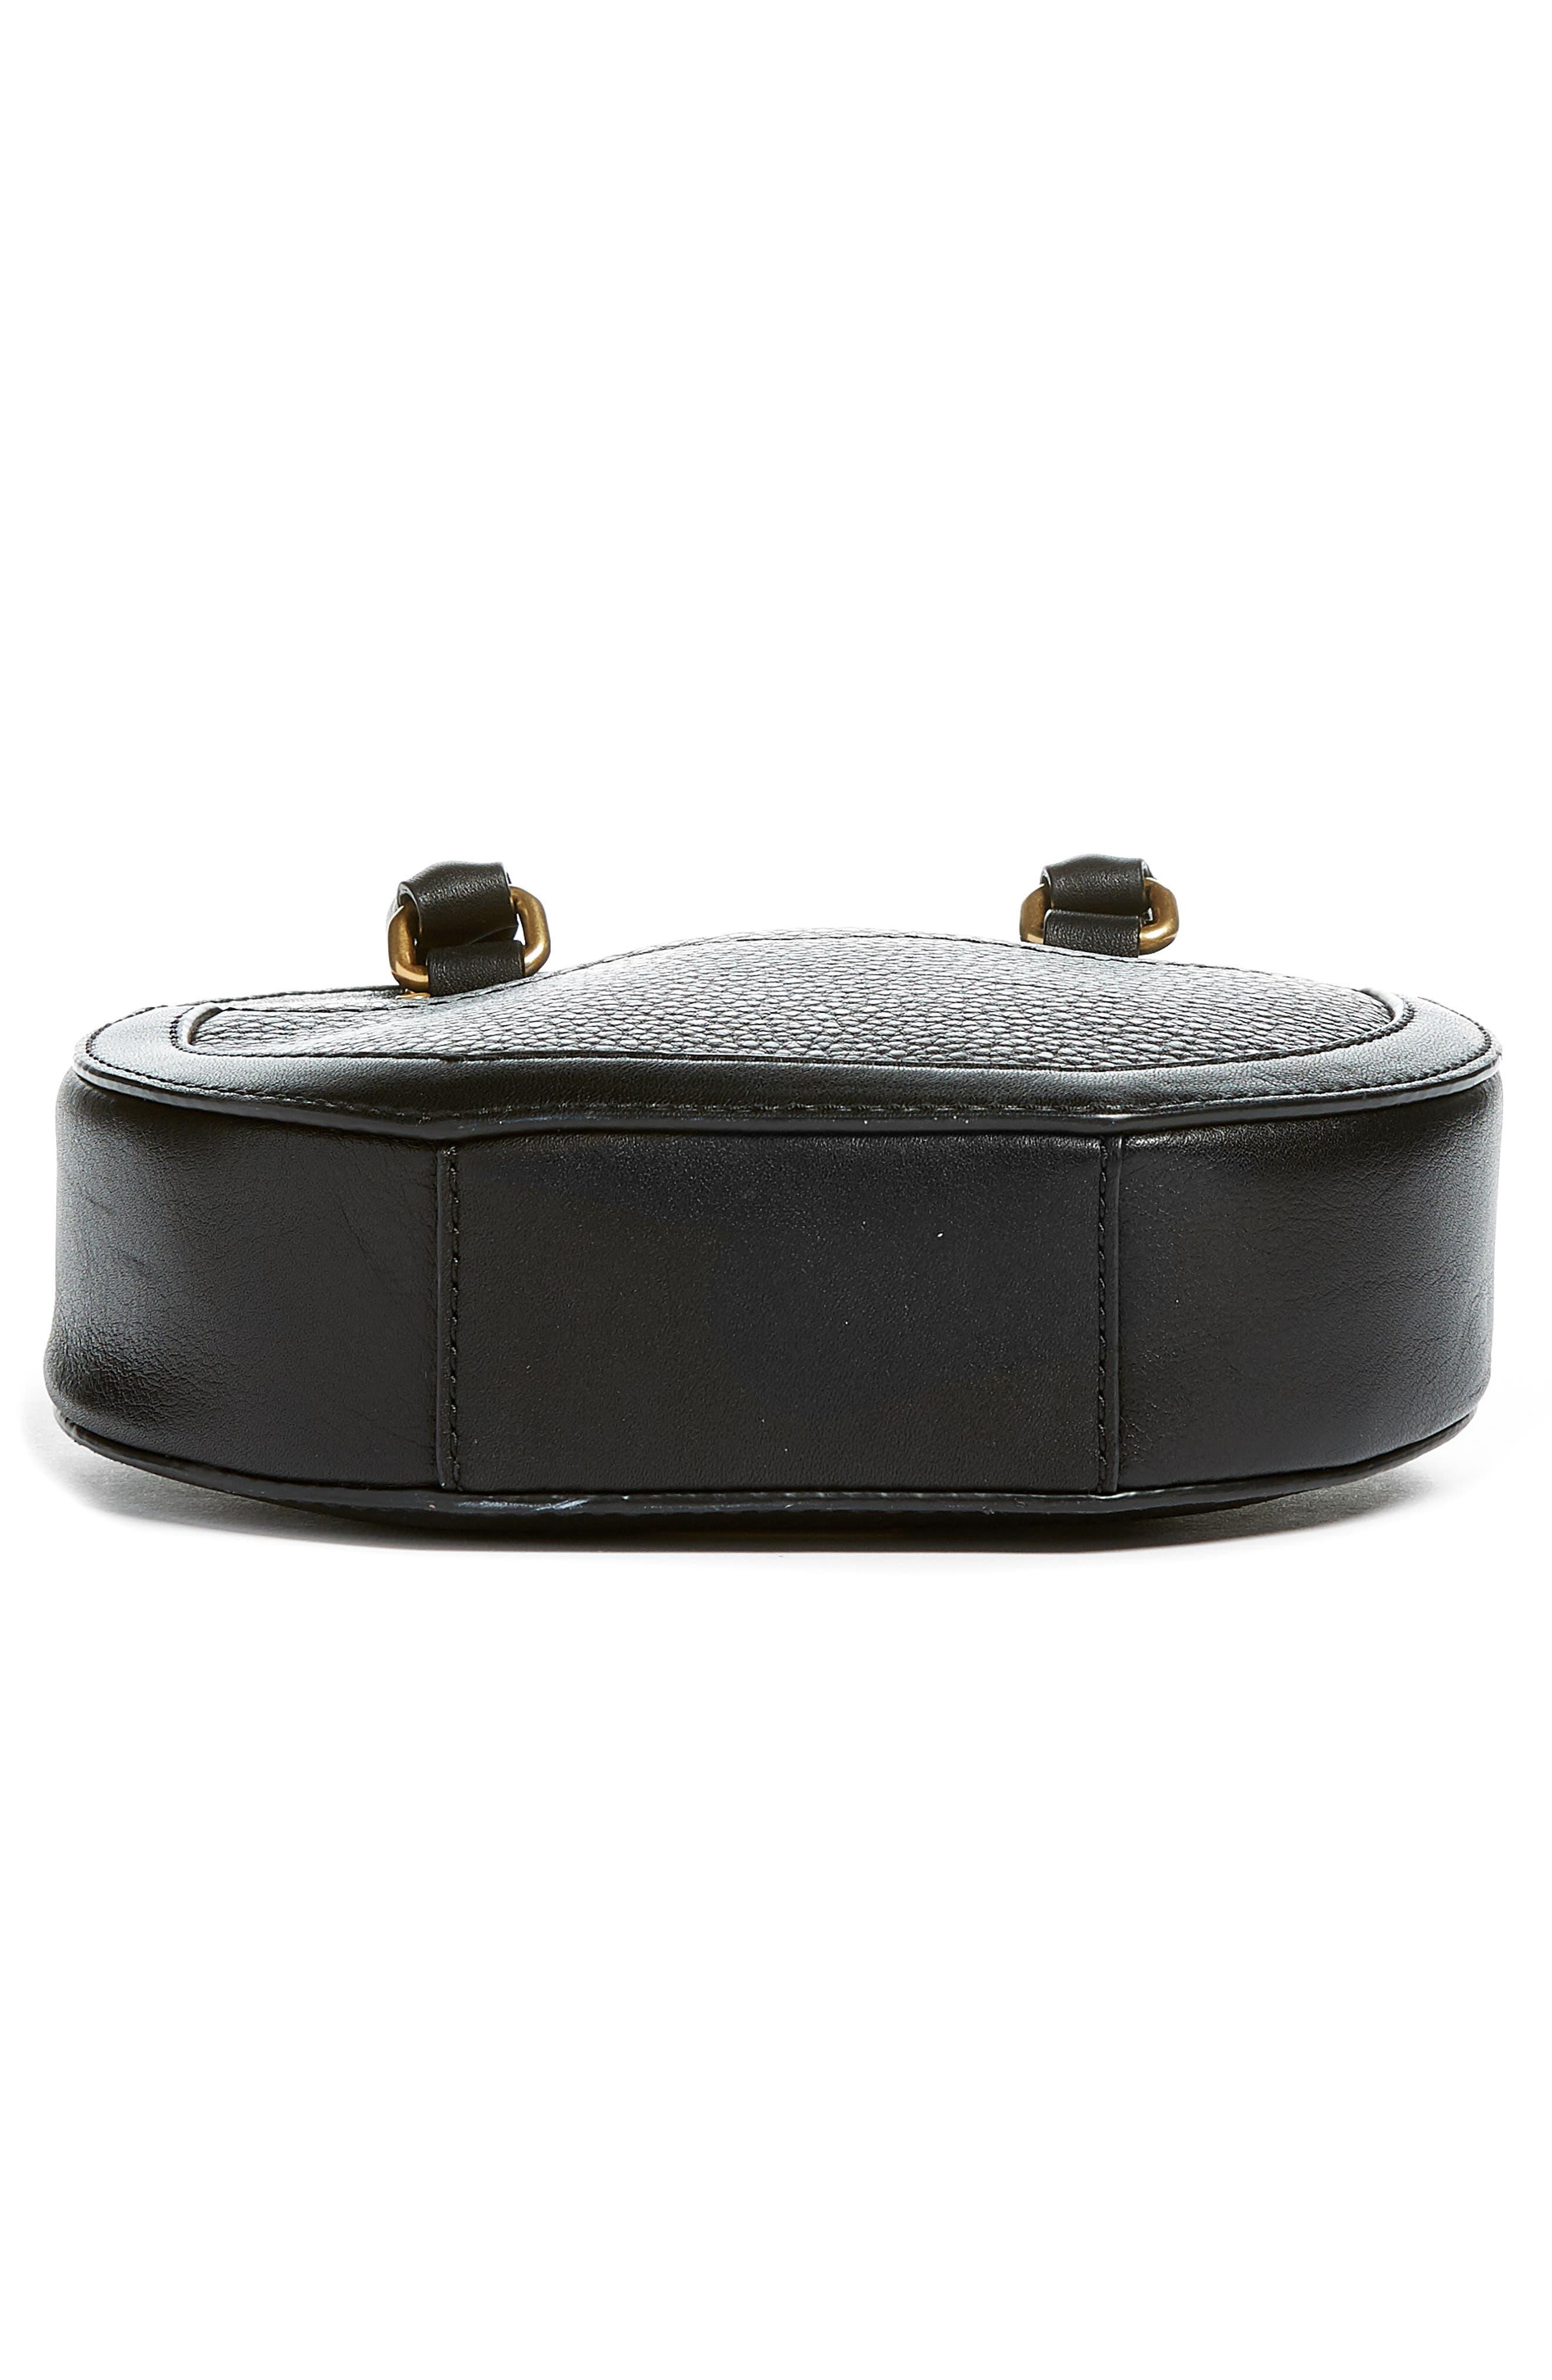 Bree Circle Leather Crossbody Bag,                             Alternate thumbnail 6, color,                             001